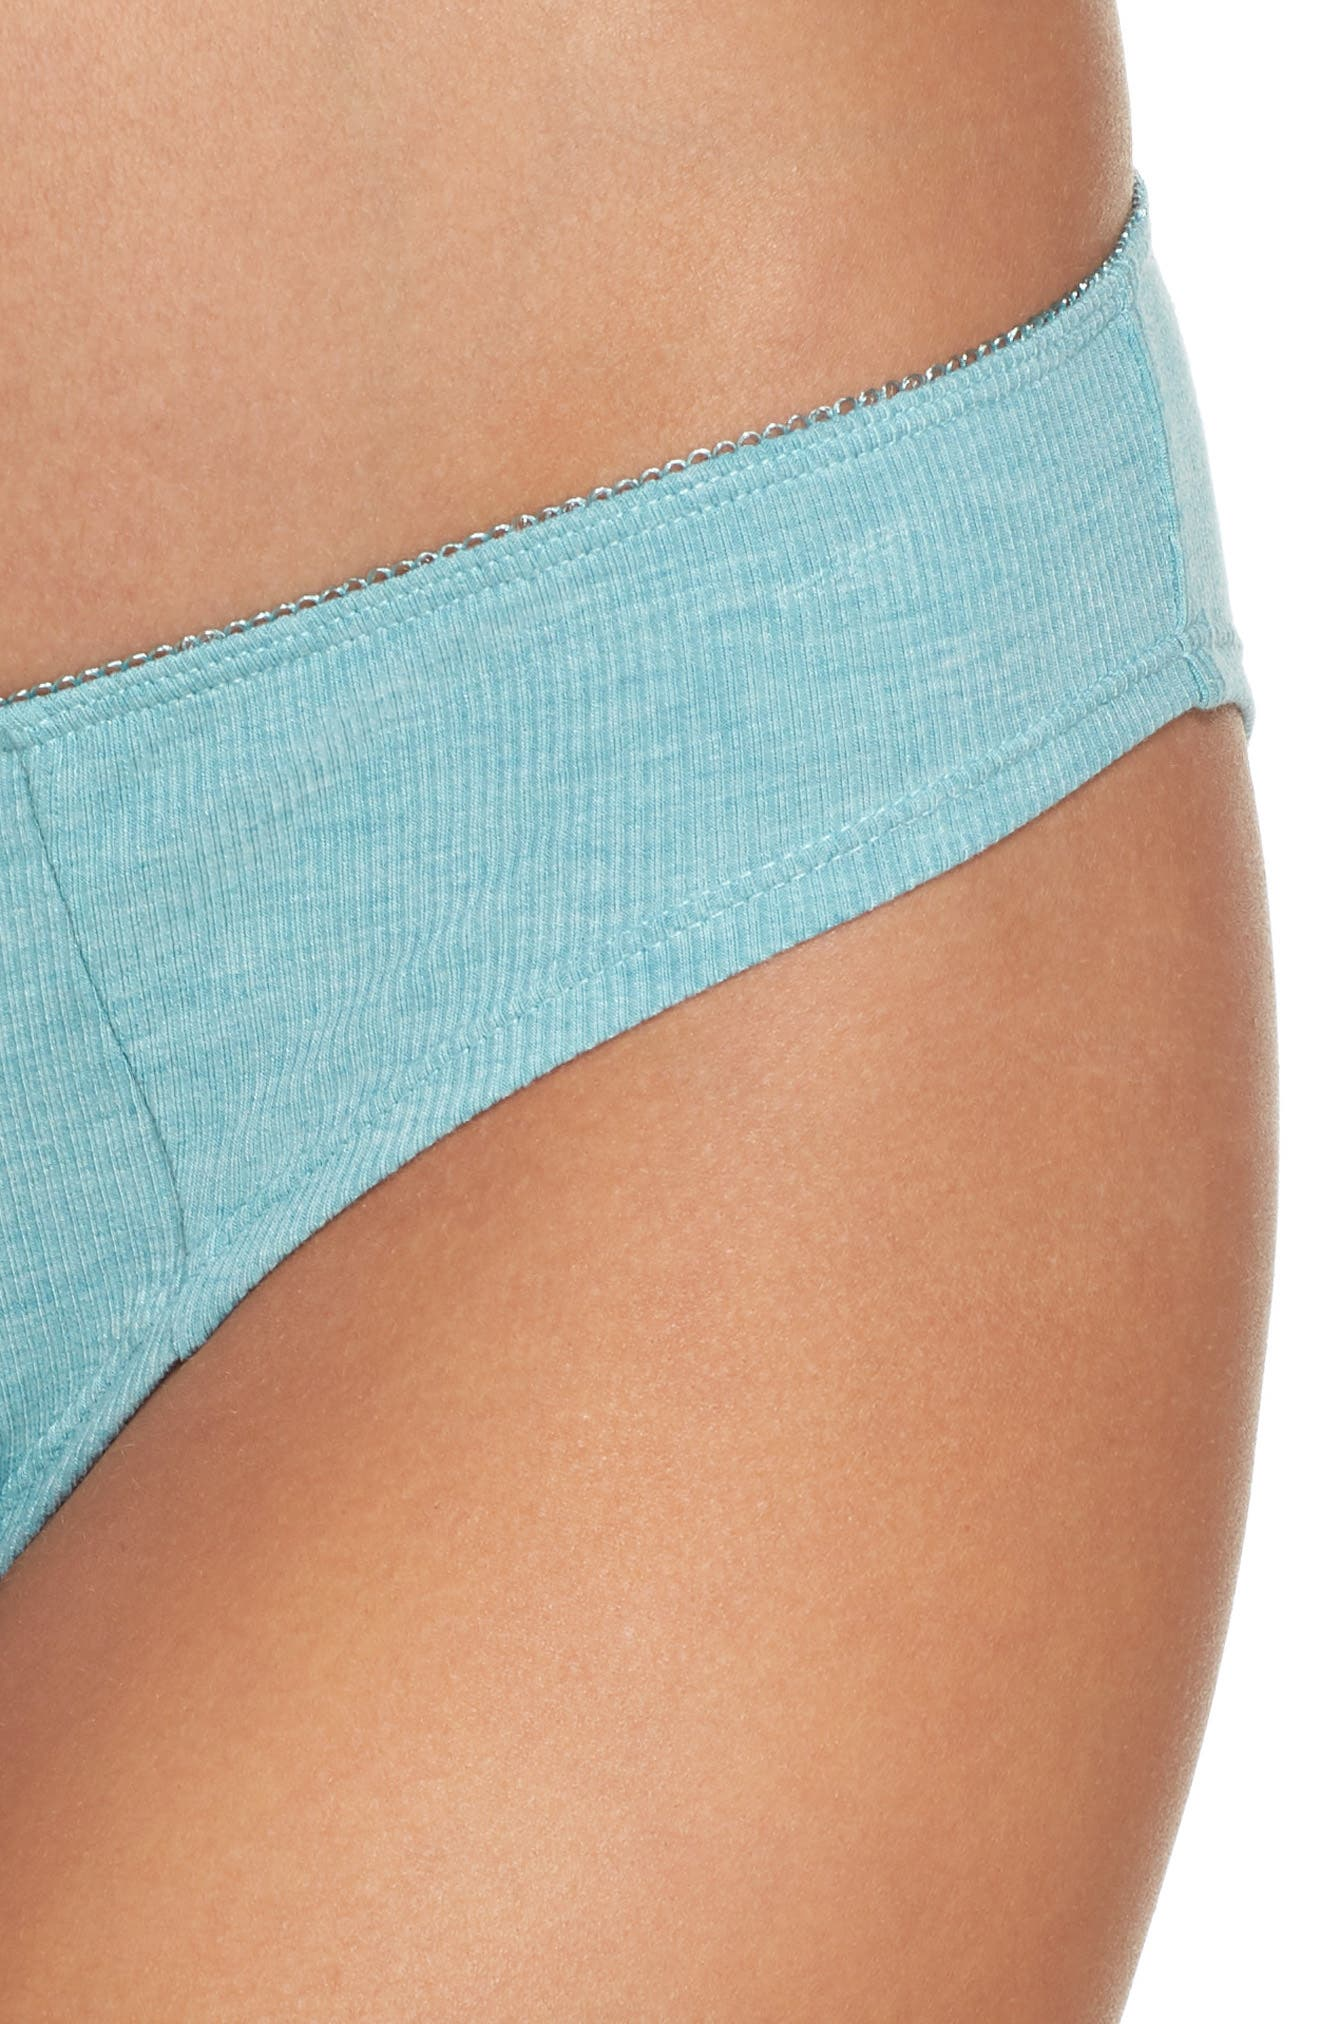 Rib Knit Bikini,                             Alternate thumbnail 4, color,                             Prickly Pear